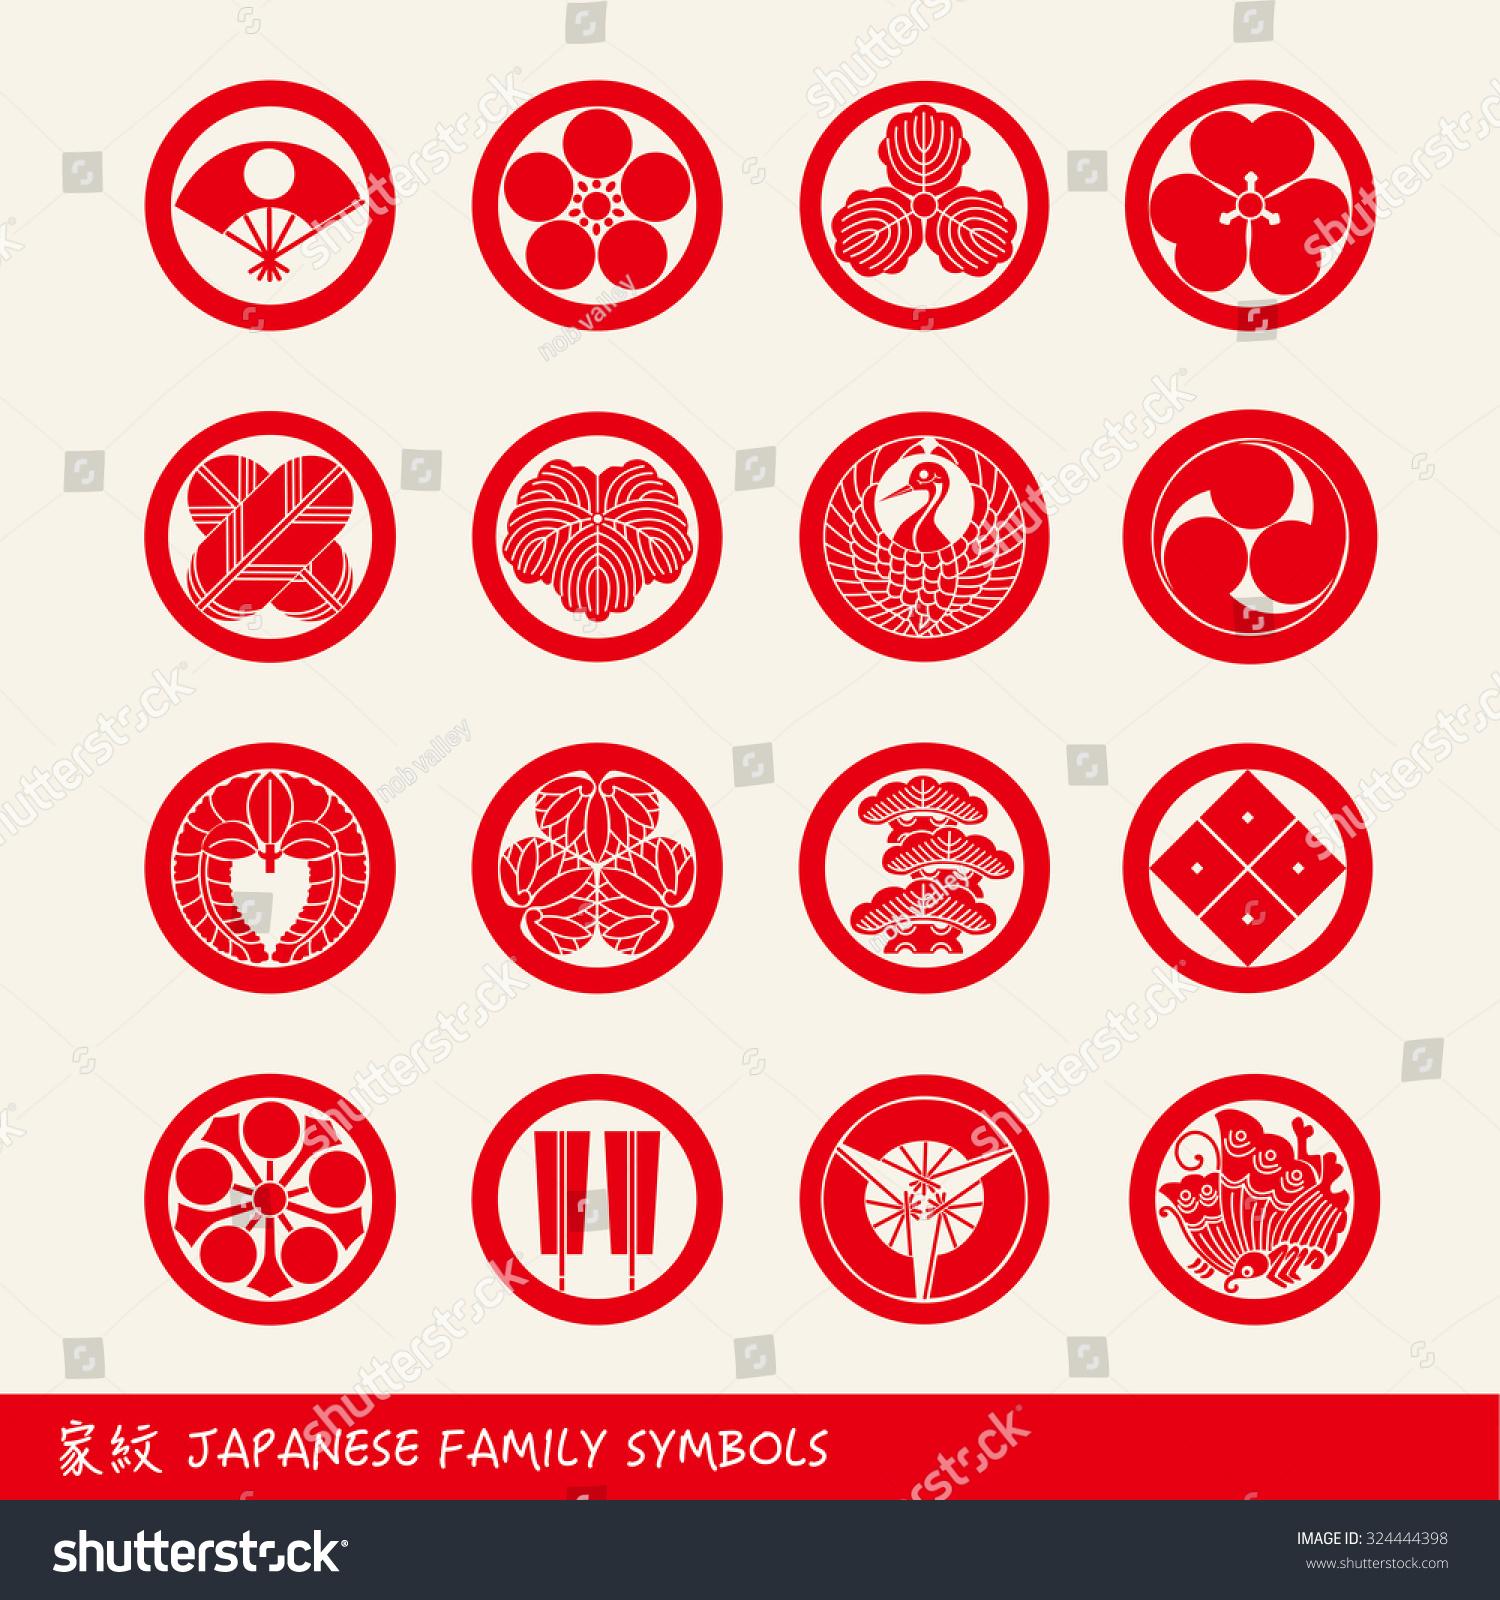 Kamon Japanese Family Symbols Stock Illustration Royalty Free